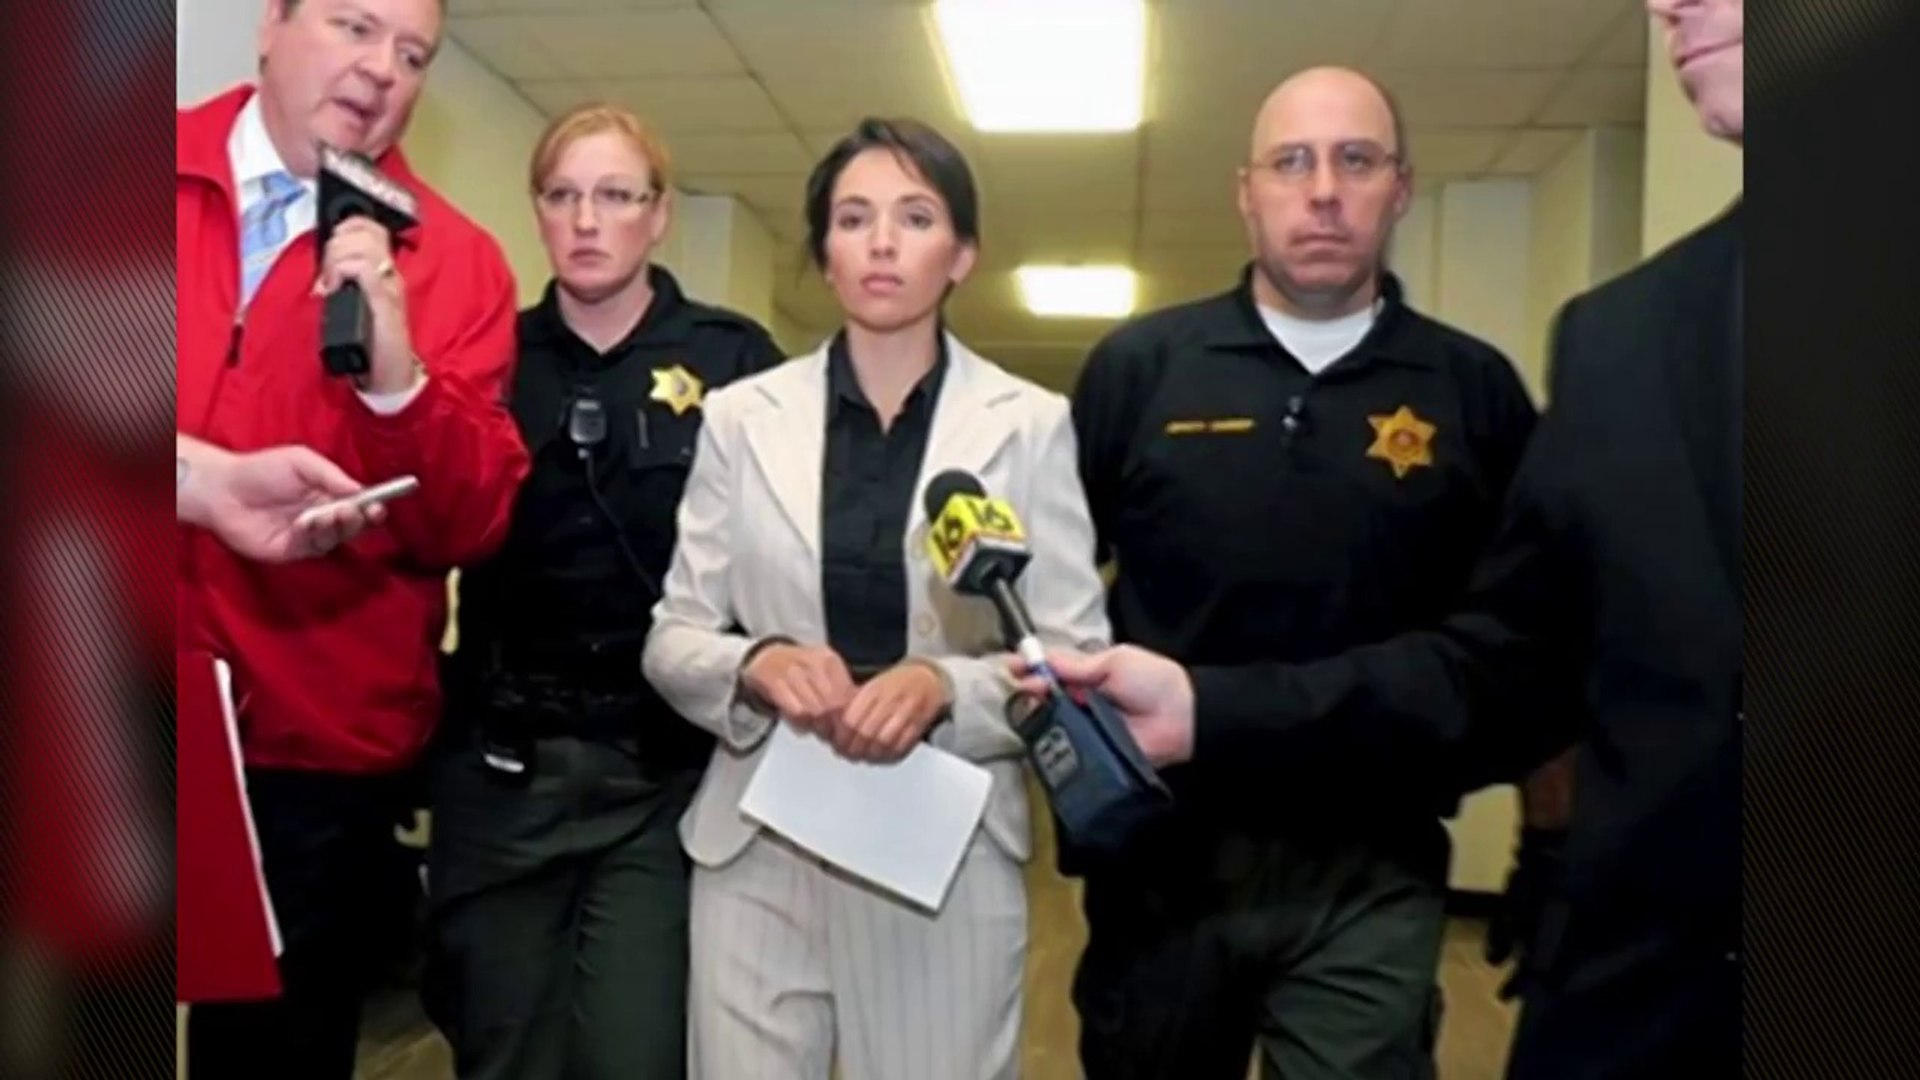 Student teacher sex - High school teacher Lauren Harrington-Cooper arrested for sex with teens.